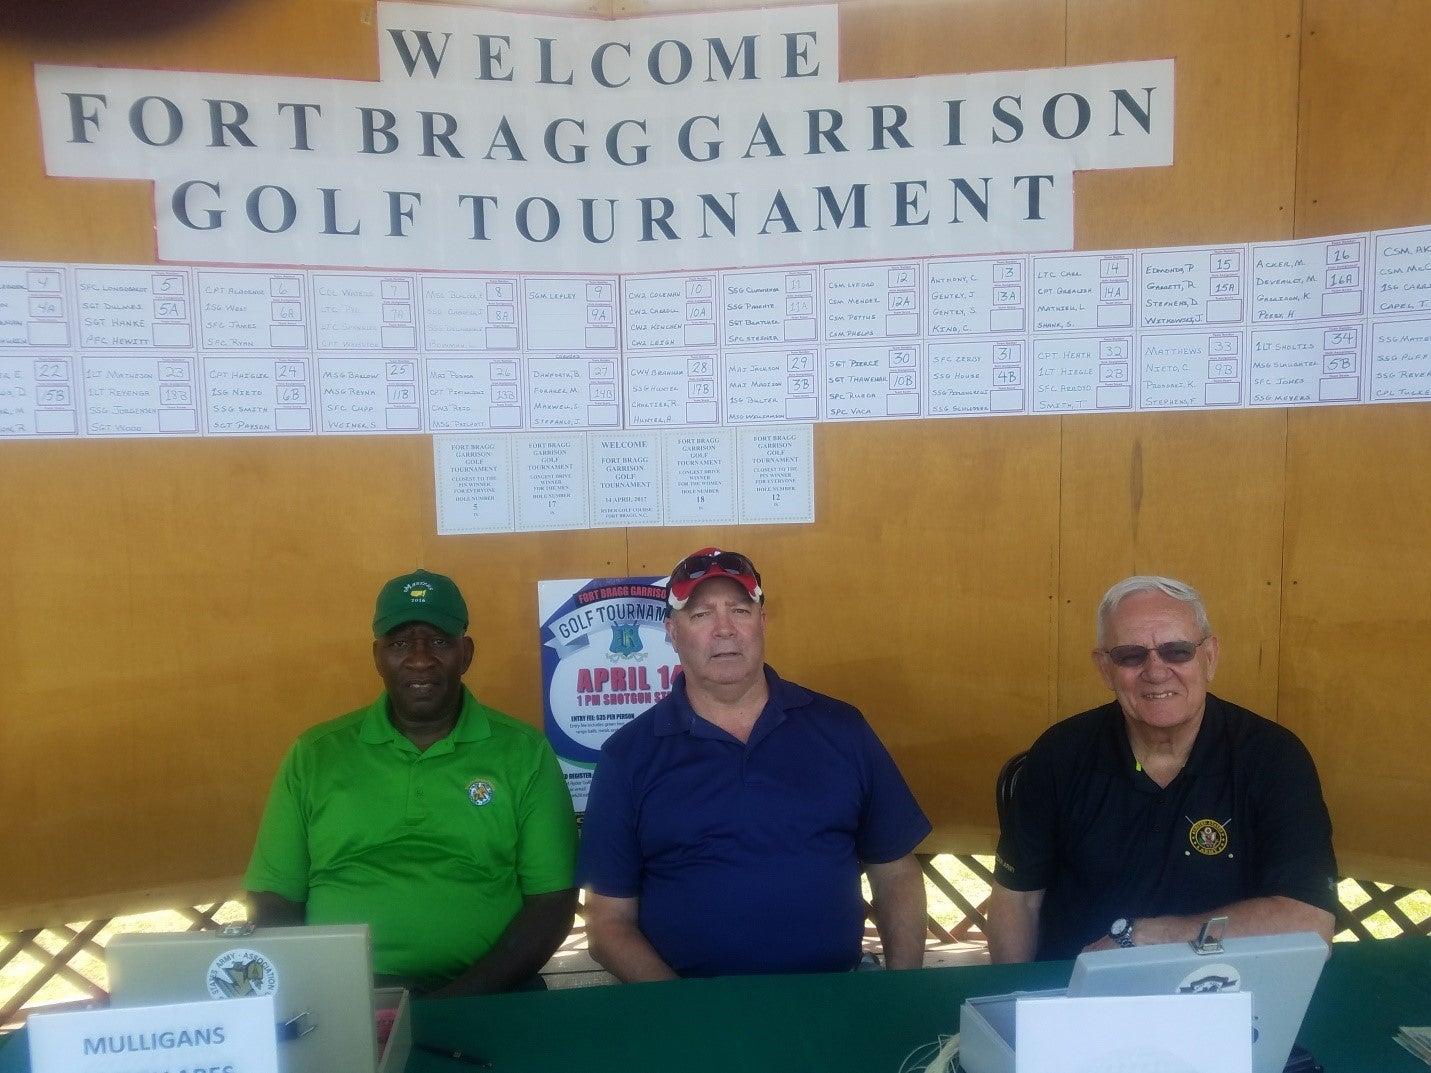 AUSA Chapter Support Team at Fort Bragg Garrison Golf Tournament